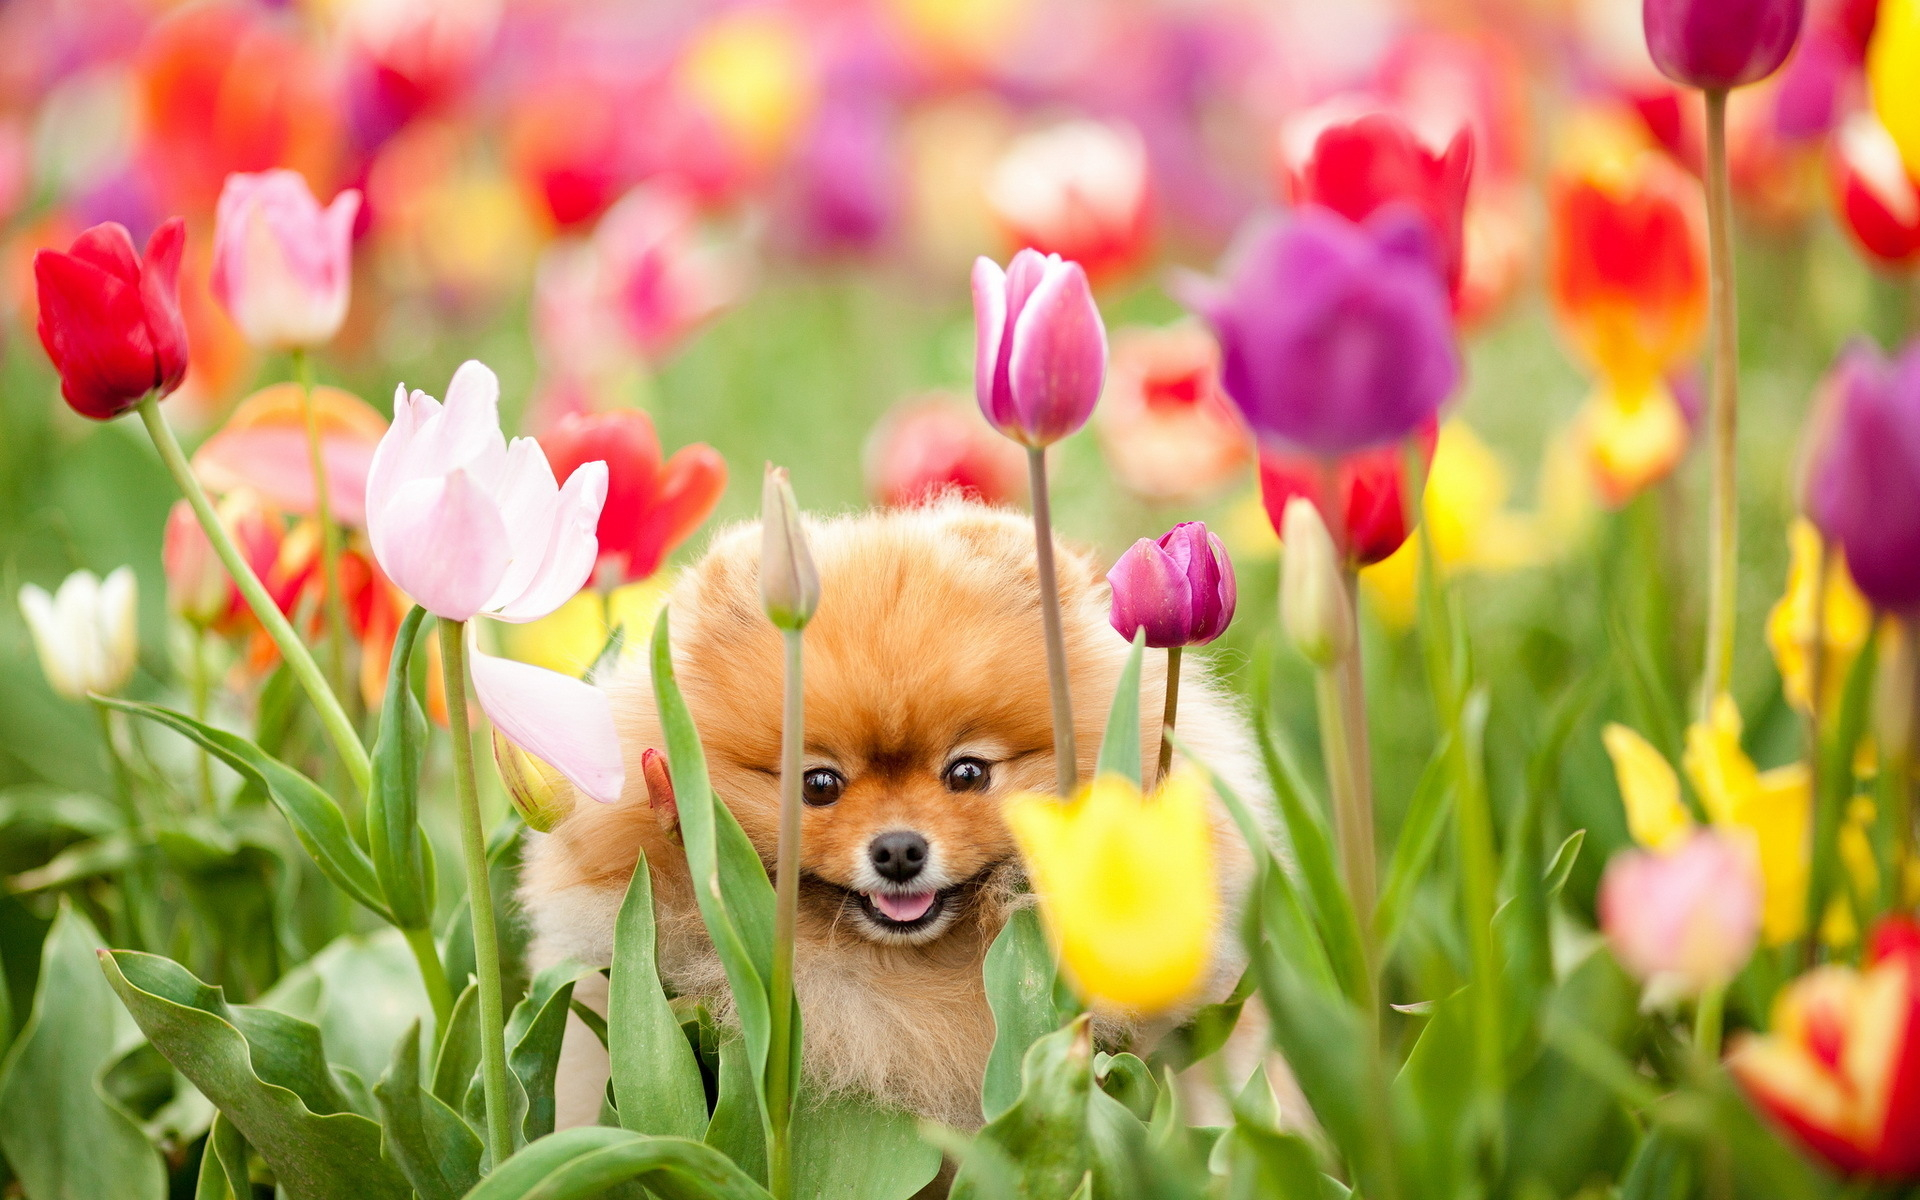 Funny Spring Dog Wallpaper Wallpapersafari